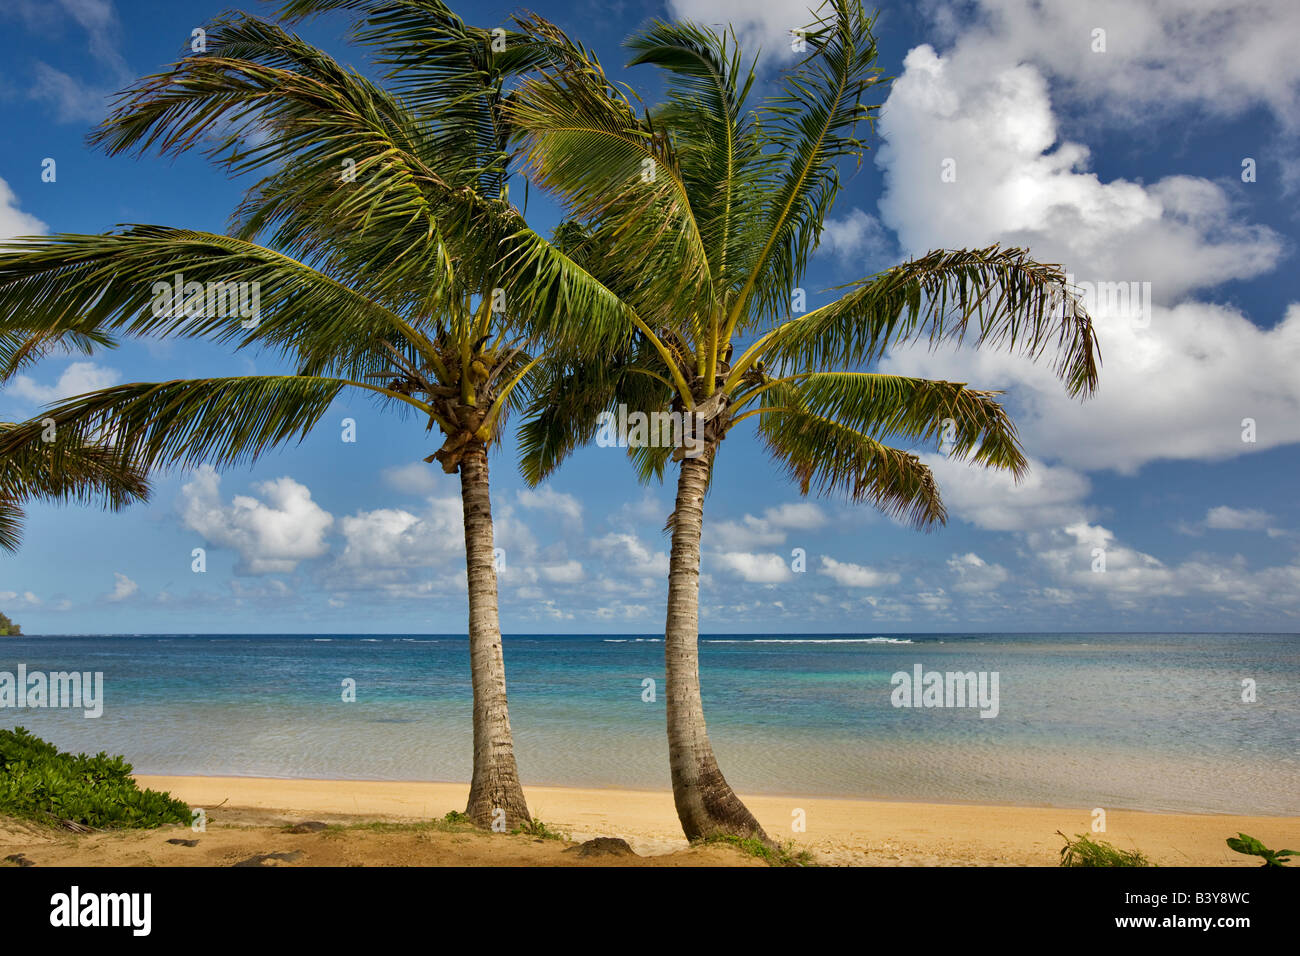 Two palm trees at Anini Beach Kauai Hawaii - Stock Image